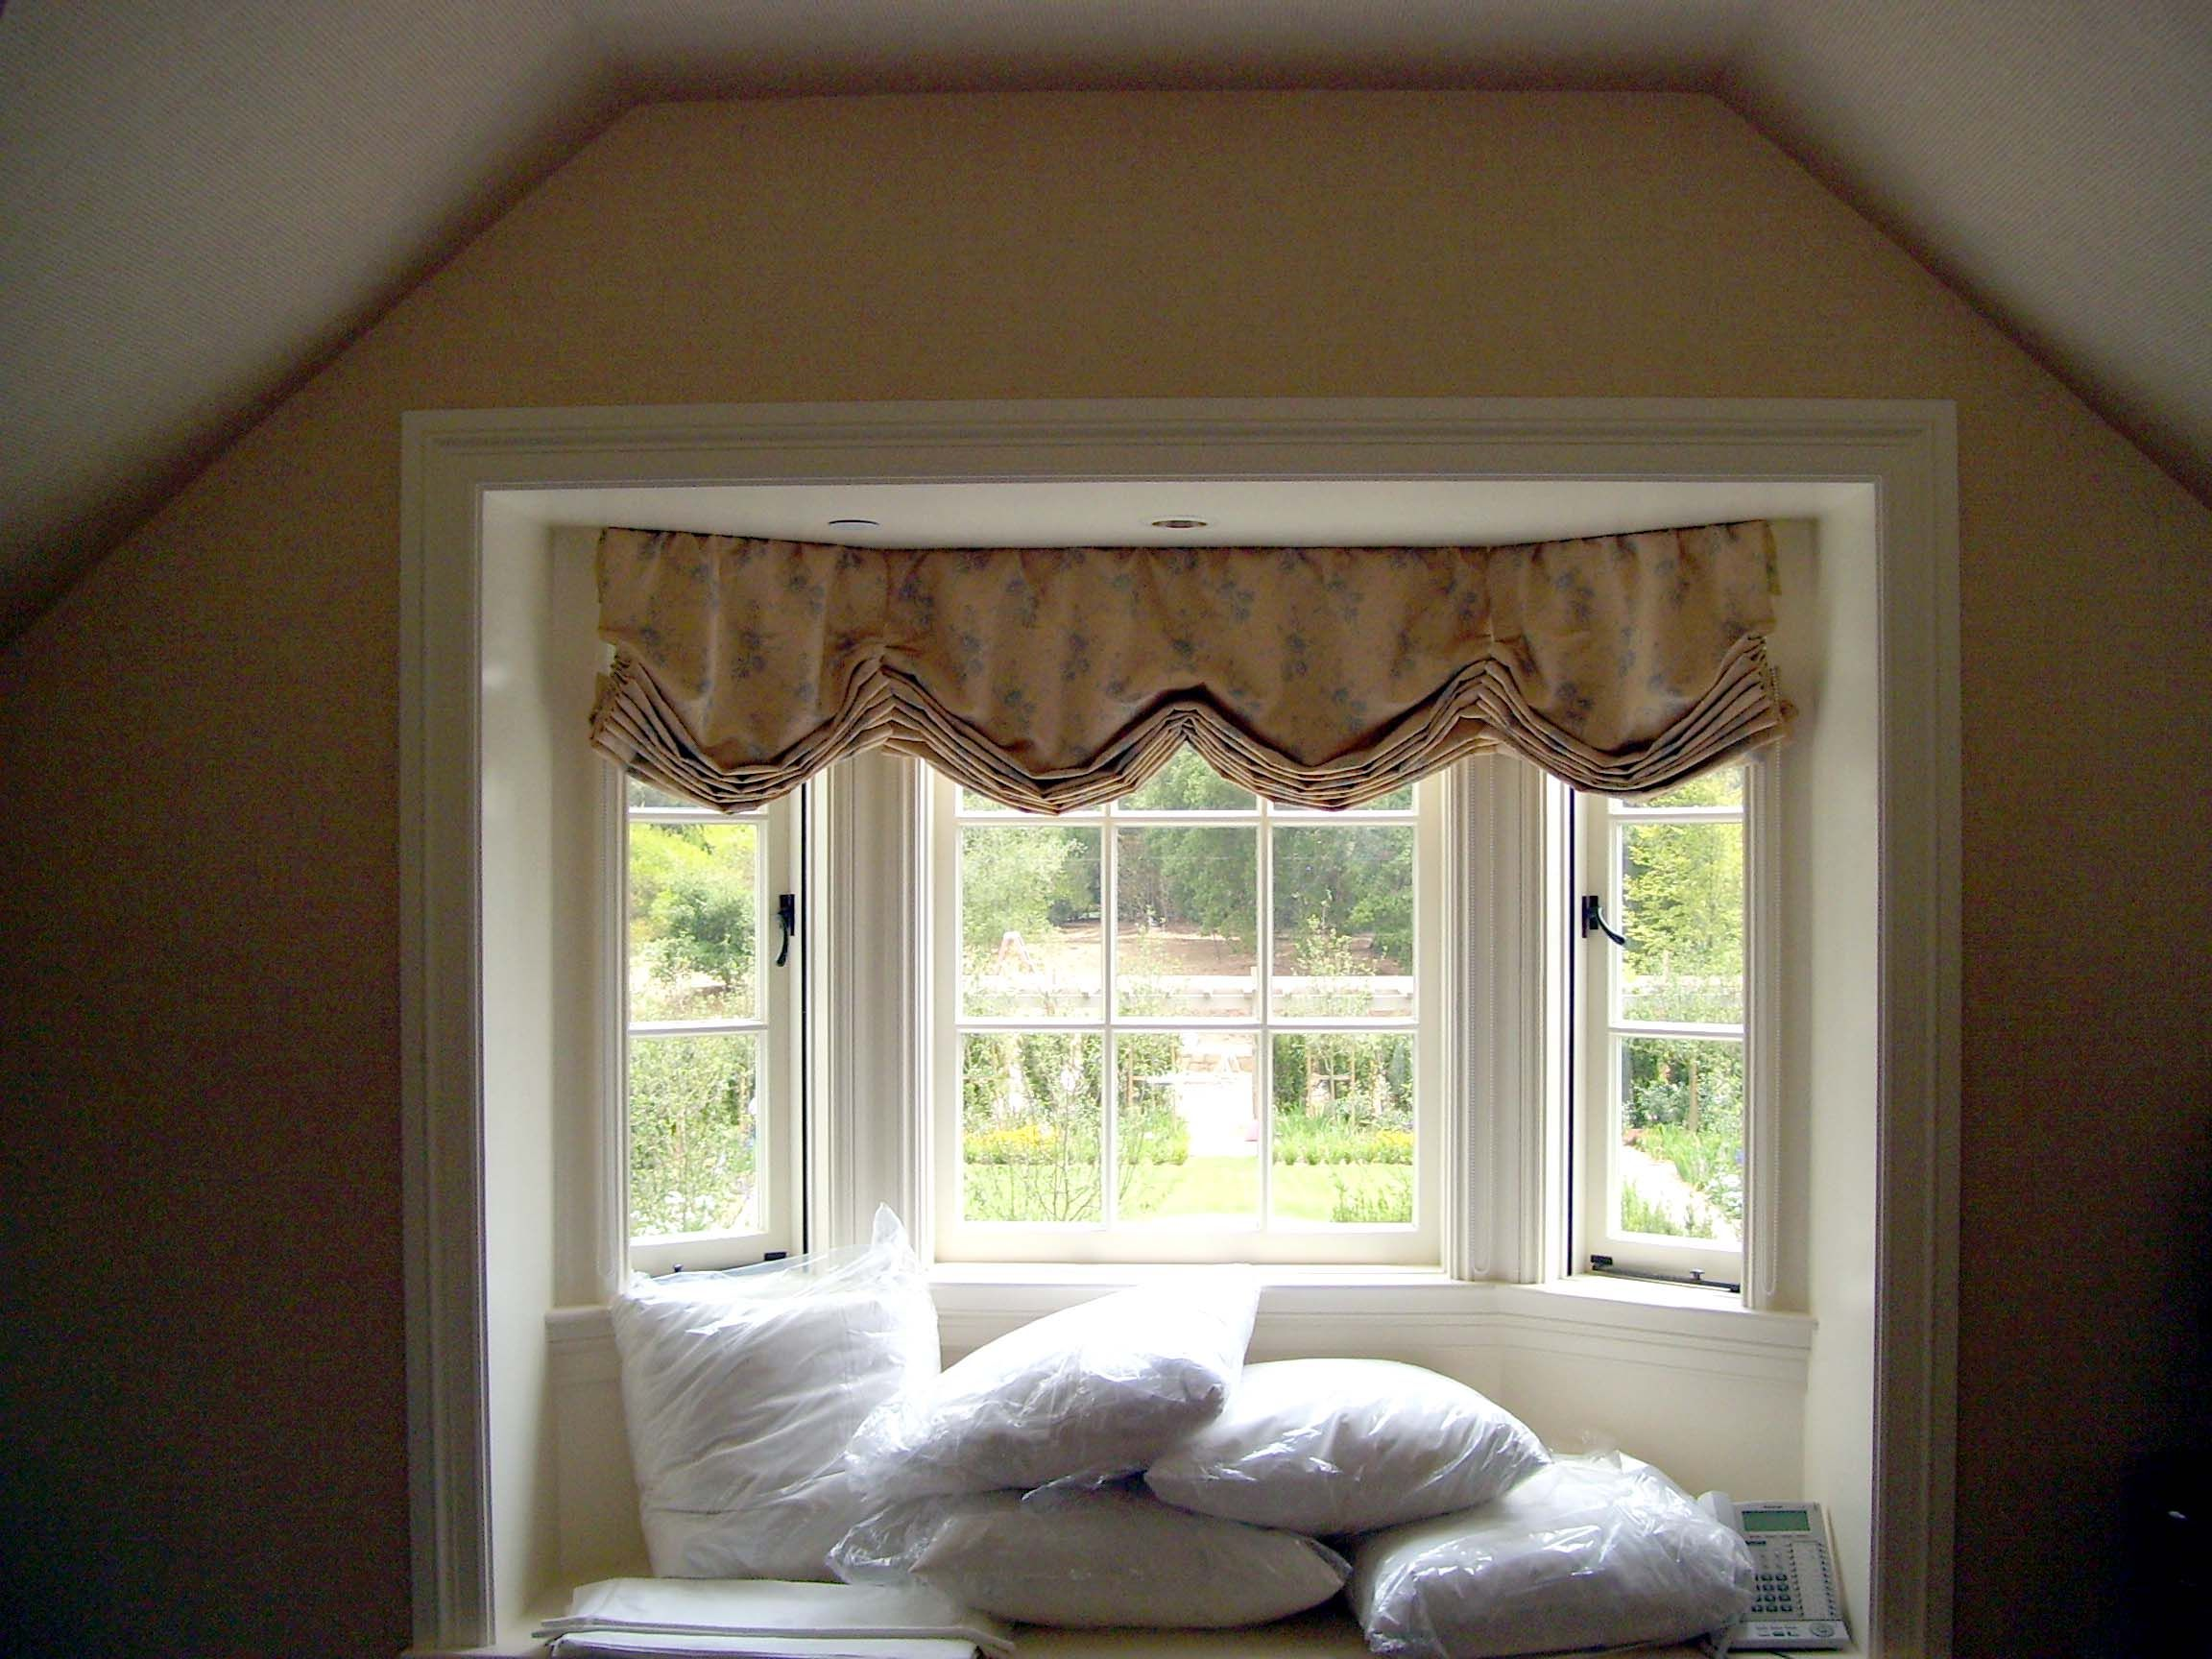 Kitchen Bay Window Treatments Portable Island With Seating Roman Shades Shade Cornice Box Silhouette Custom